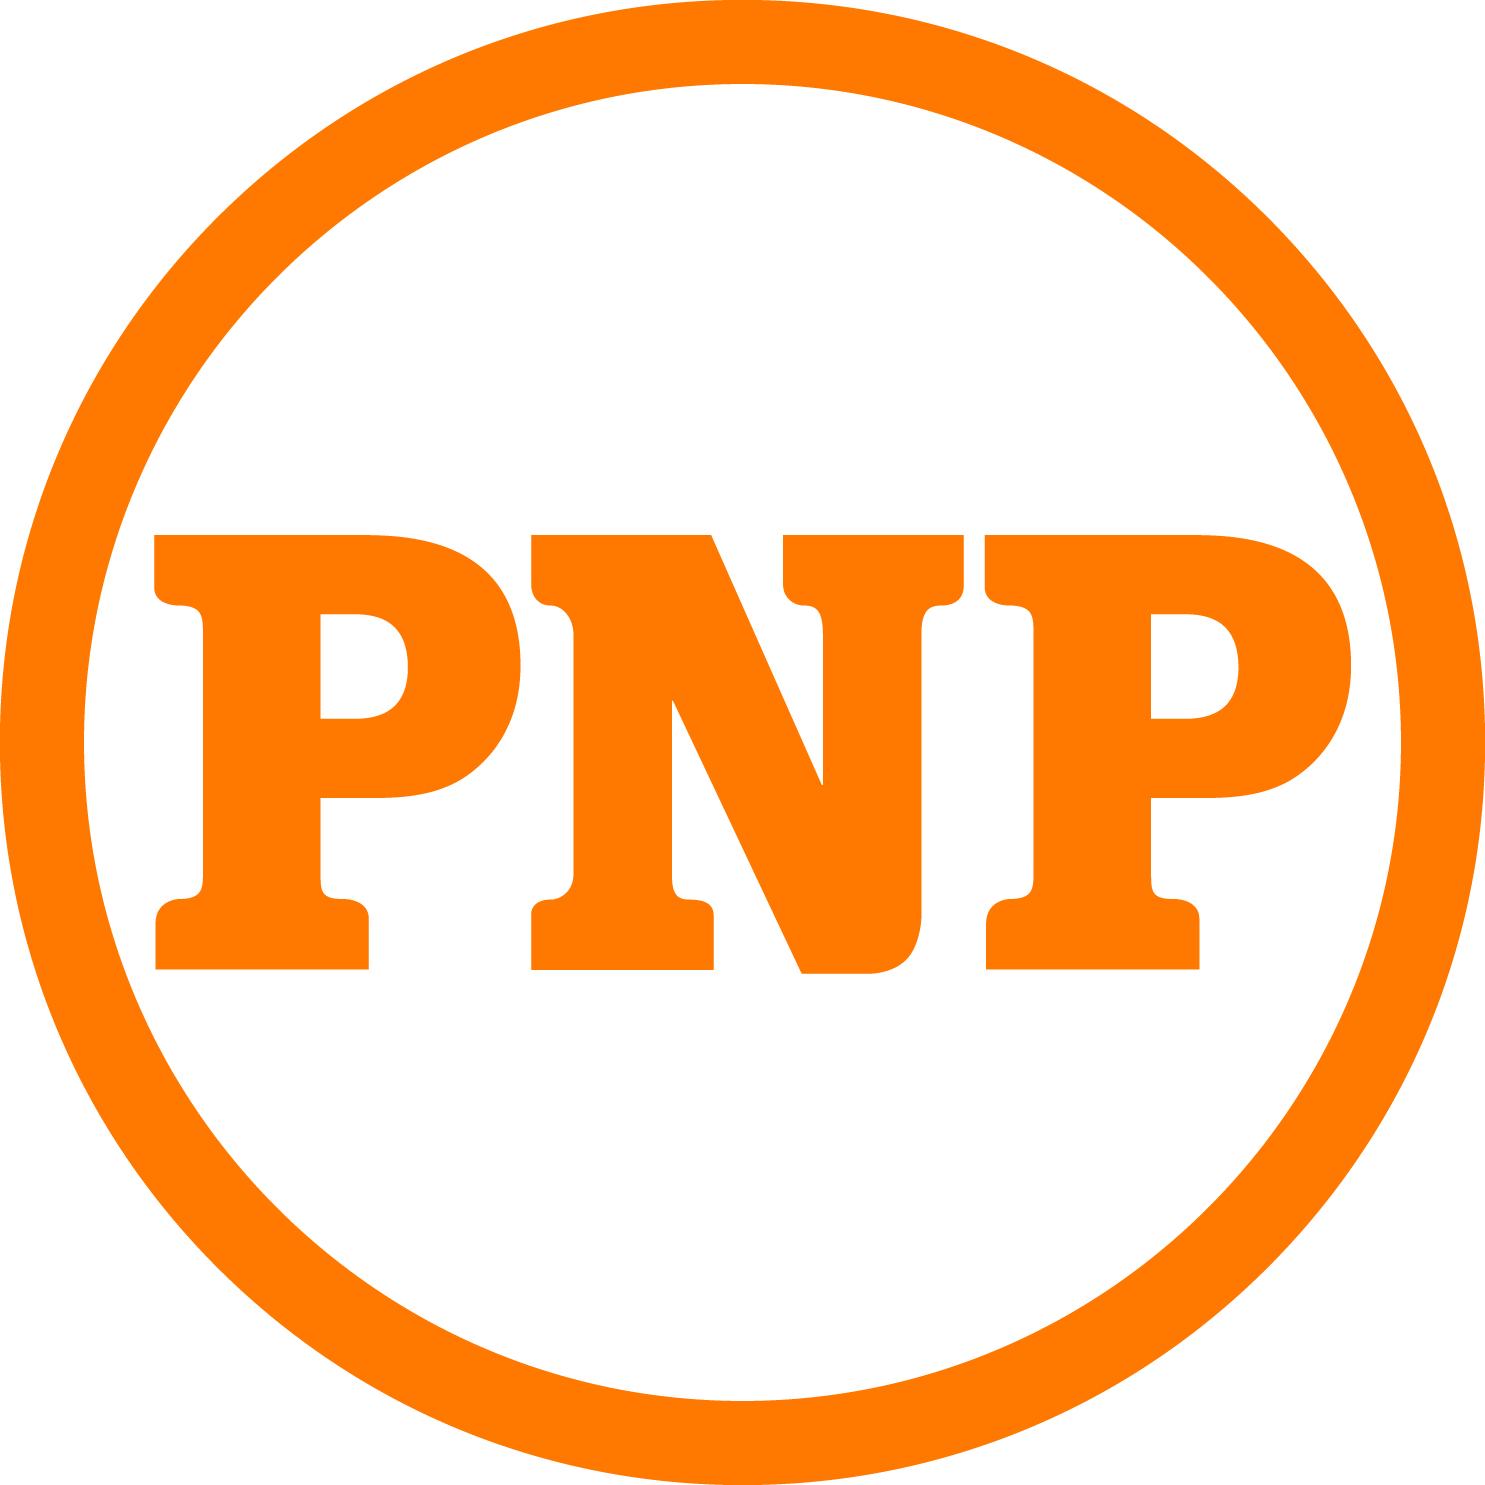 Pnp acronym sex